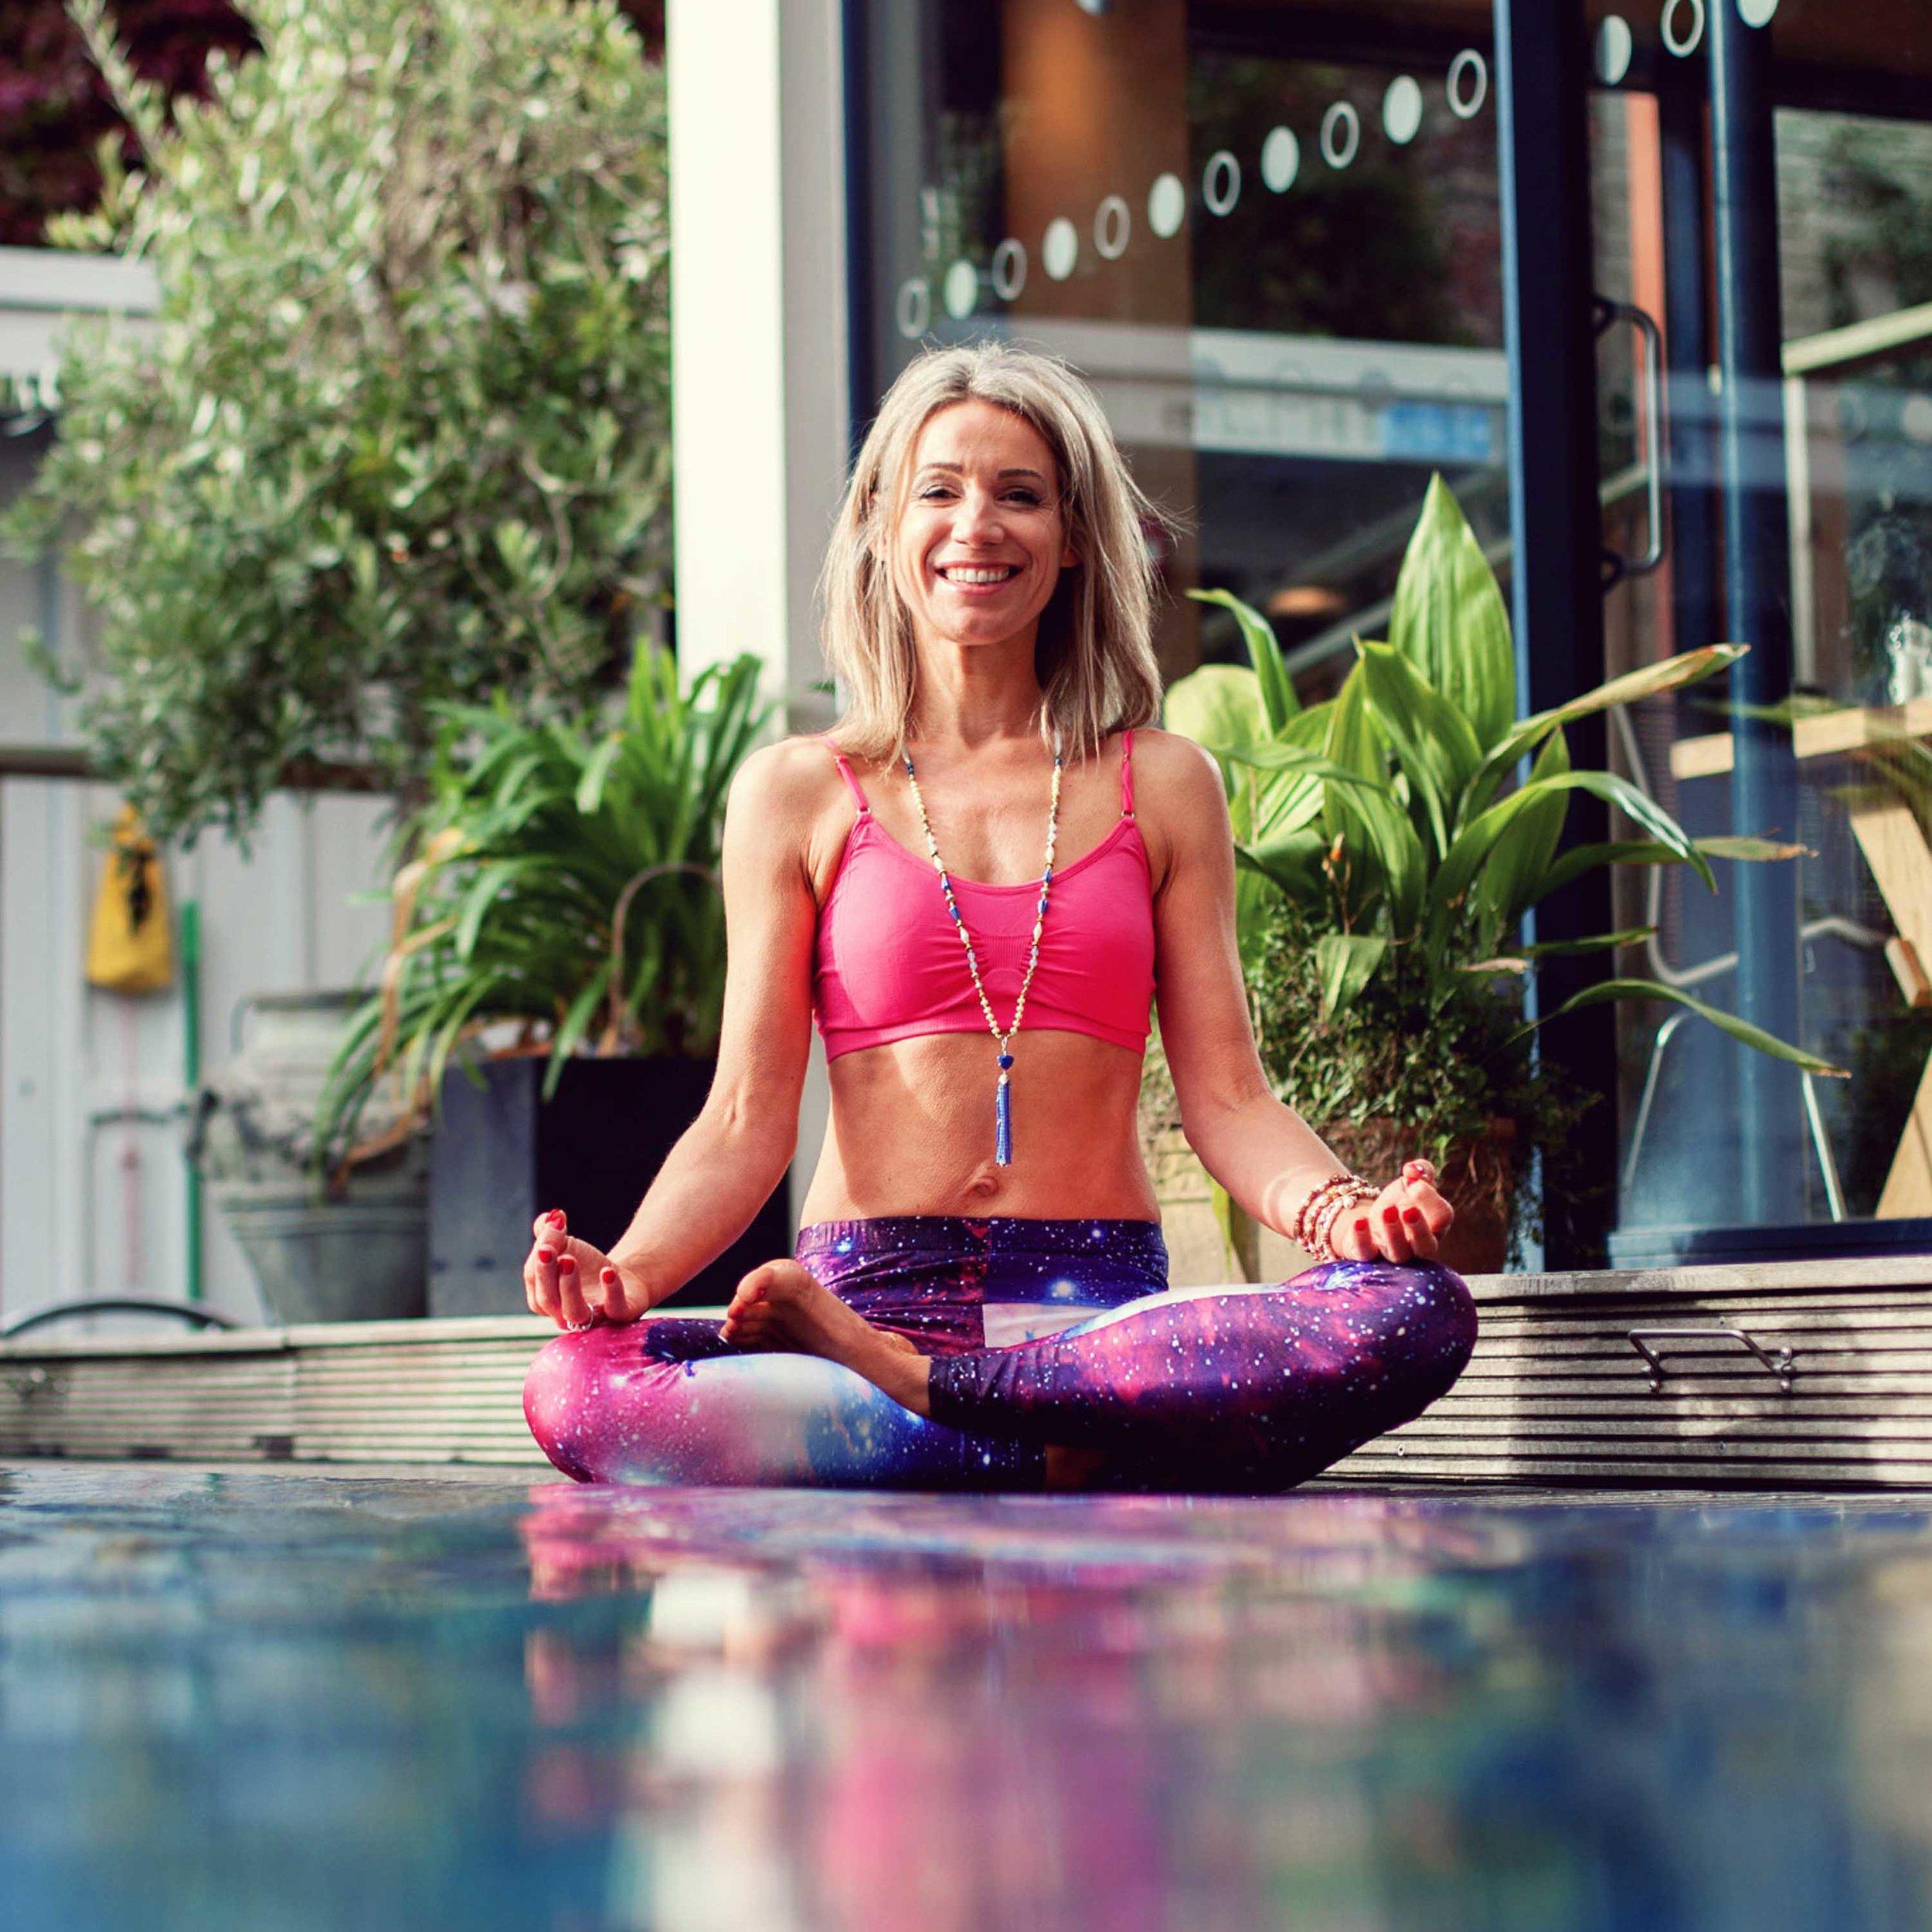 Yoga teacher Bristol,UK. Online Yoga for mums. Online Busy mums yoga. Online Beginner yoga for mums. Online Pregnancy Yoga. Online Postnatal yoga. Online fitness yoga for mums. Online Weight loss yoga for mums. Yoga classes henleaze, Westbury Park, Redland, Bristol. Private Yoga Bristol